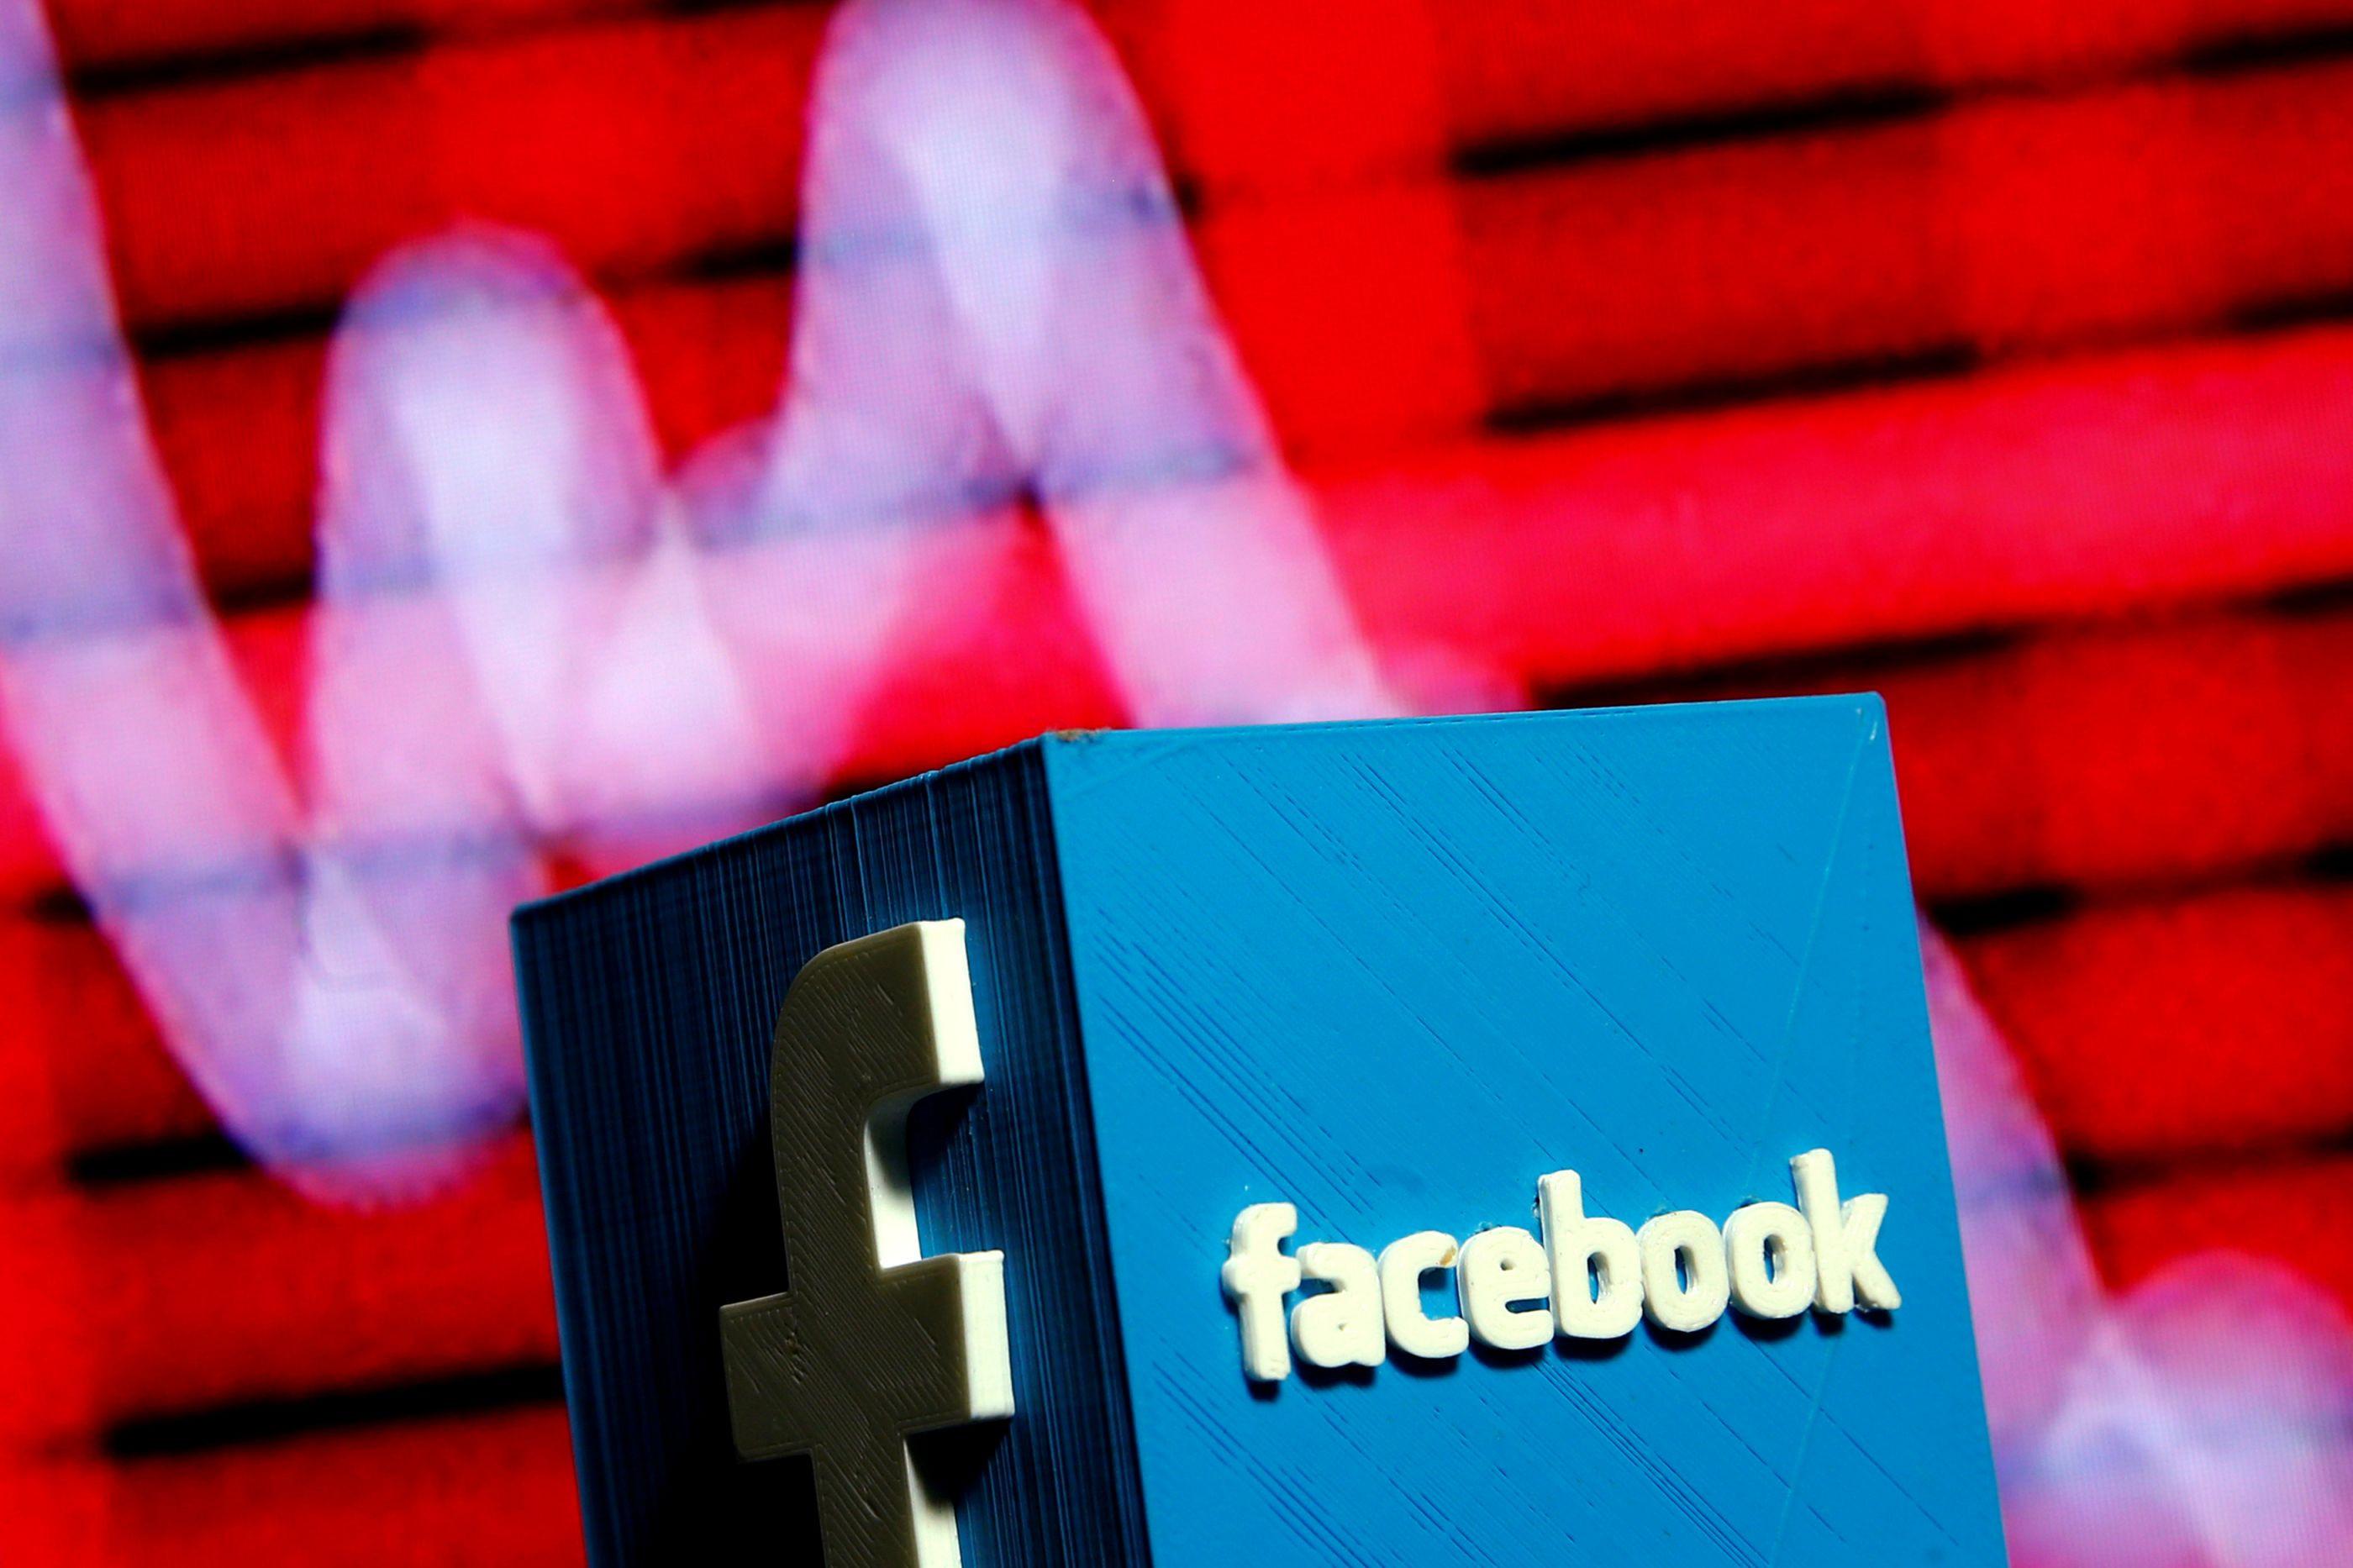 Facebook admite problemas no combate ao discurso de ódio